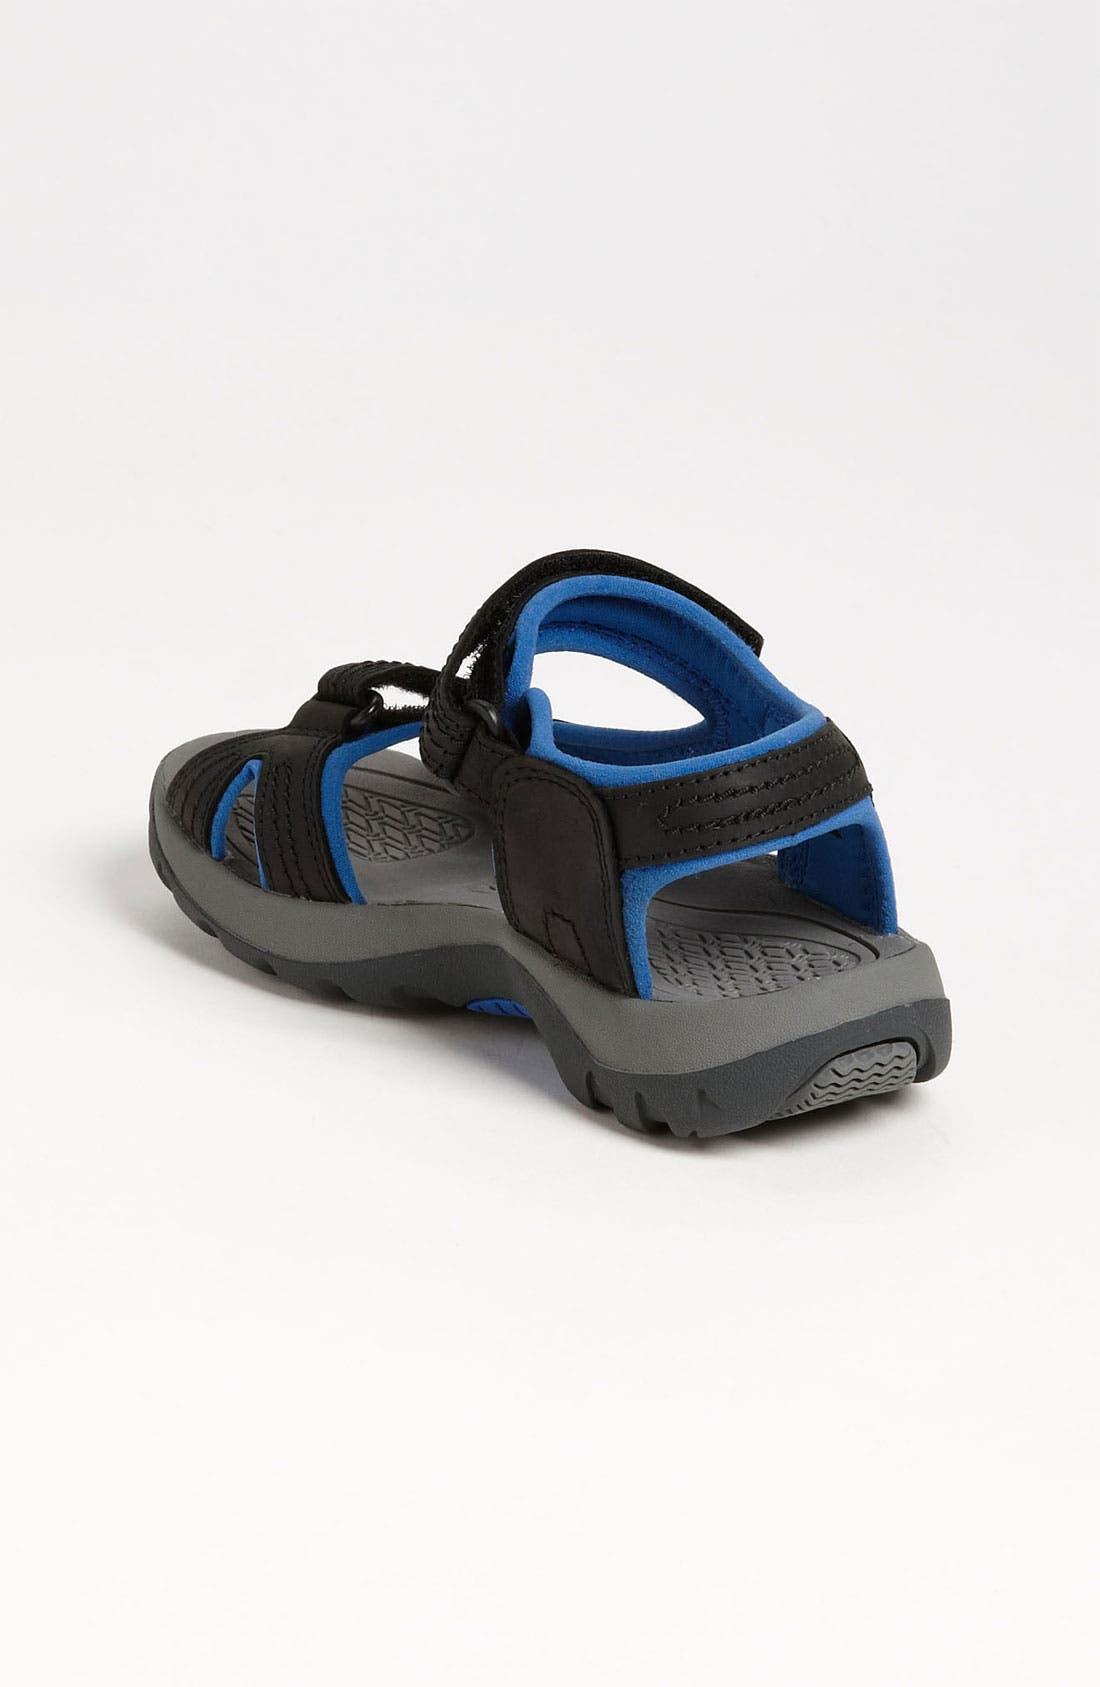 Alternate Image 2  - Keen 'Jura' Leather Sandal (Toddler, Little Kid & Big Kid)